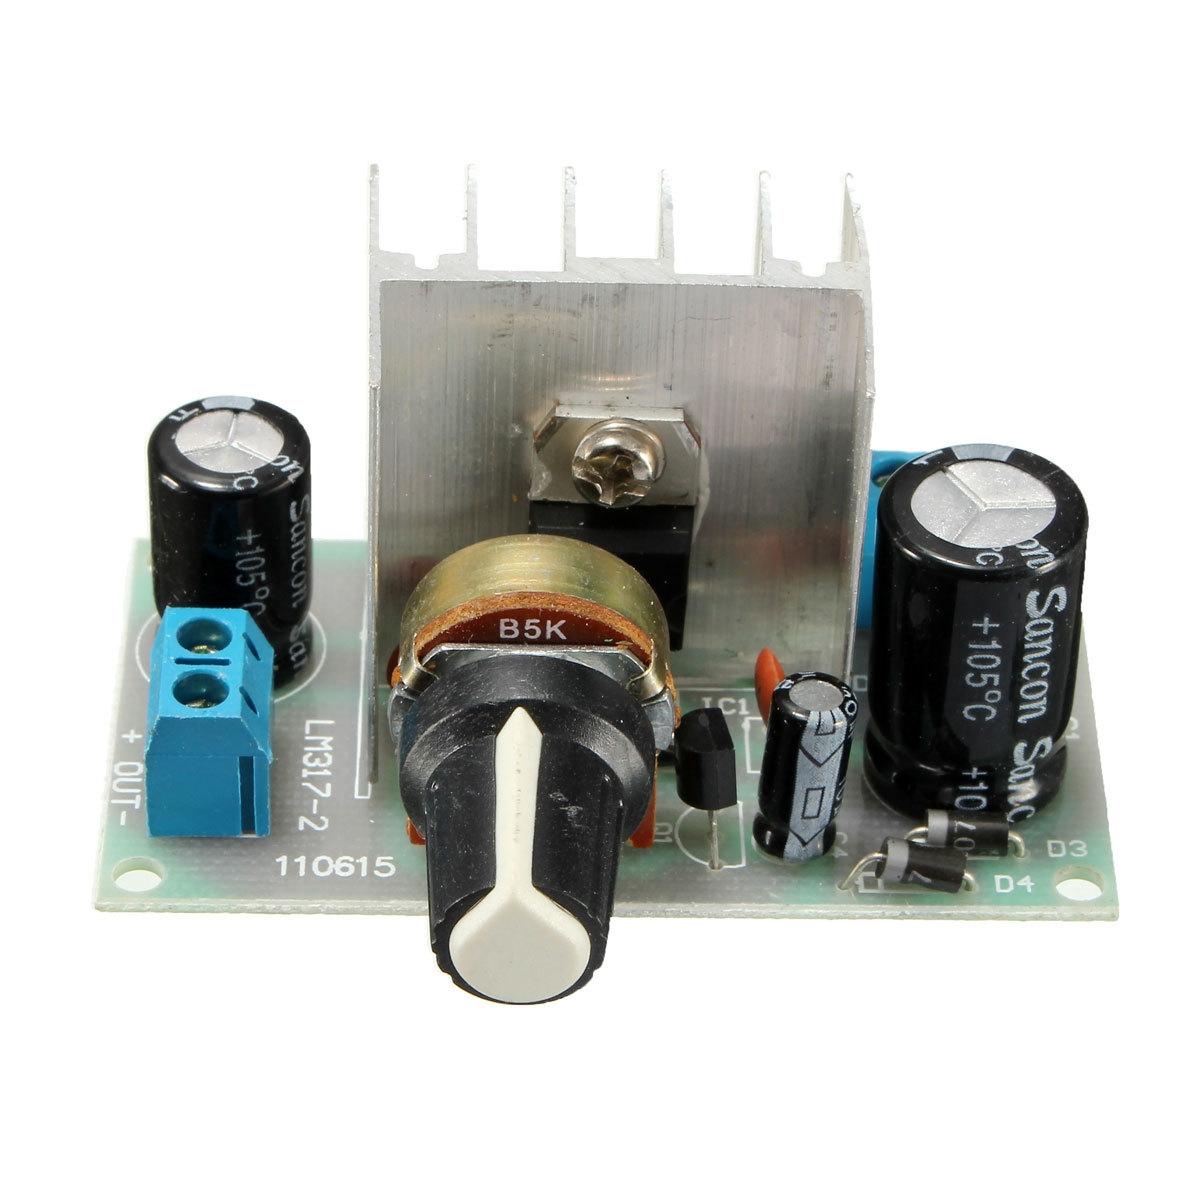 Buy Universal Freebang New 6 24v Lm317 Ac Dc To Adjustable Voltage Regulator 1x